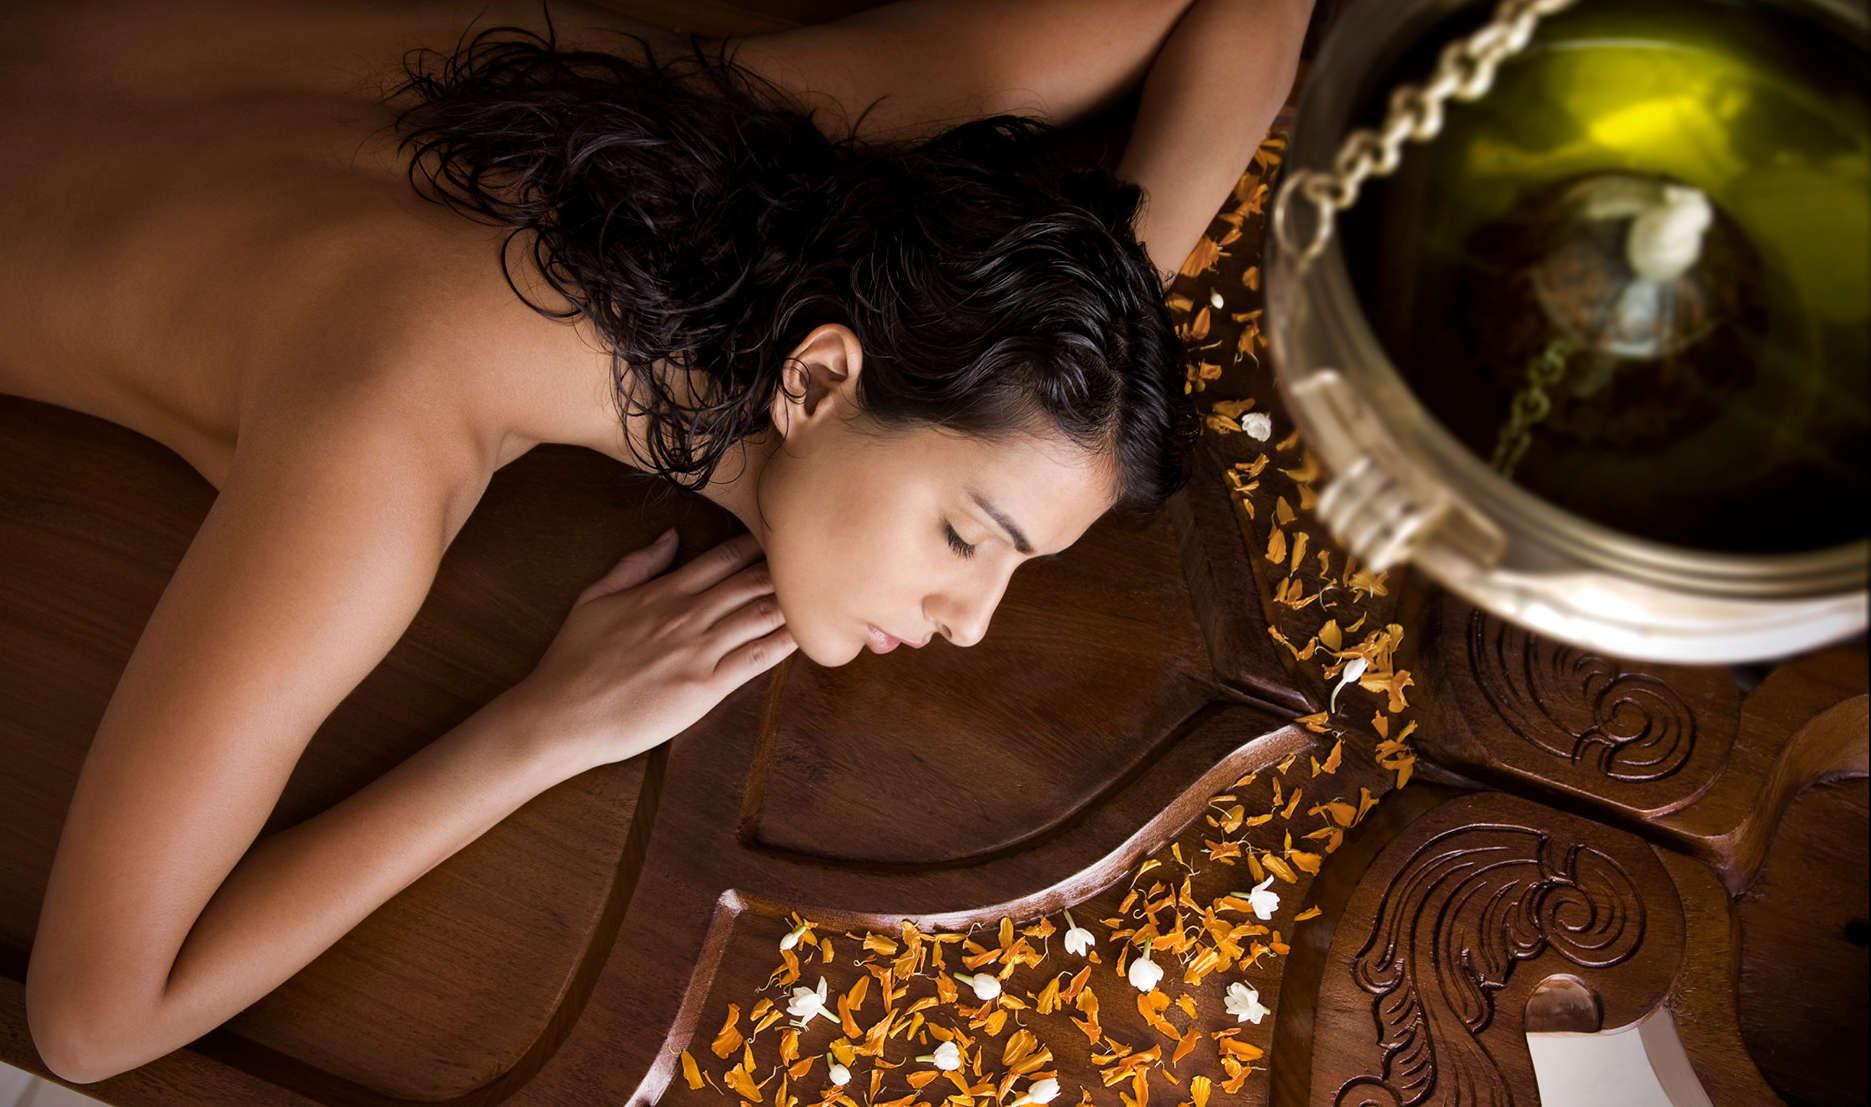 Get an Ayurvedic massage